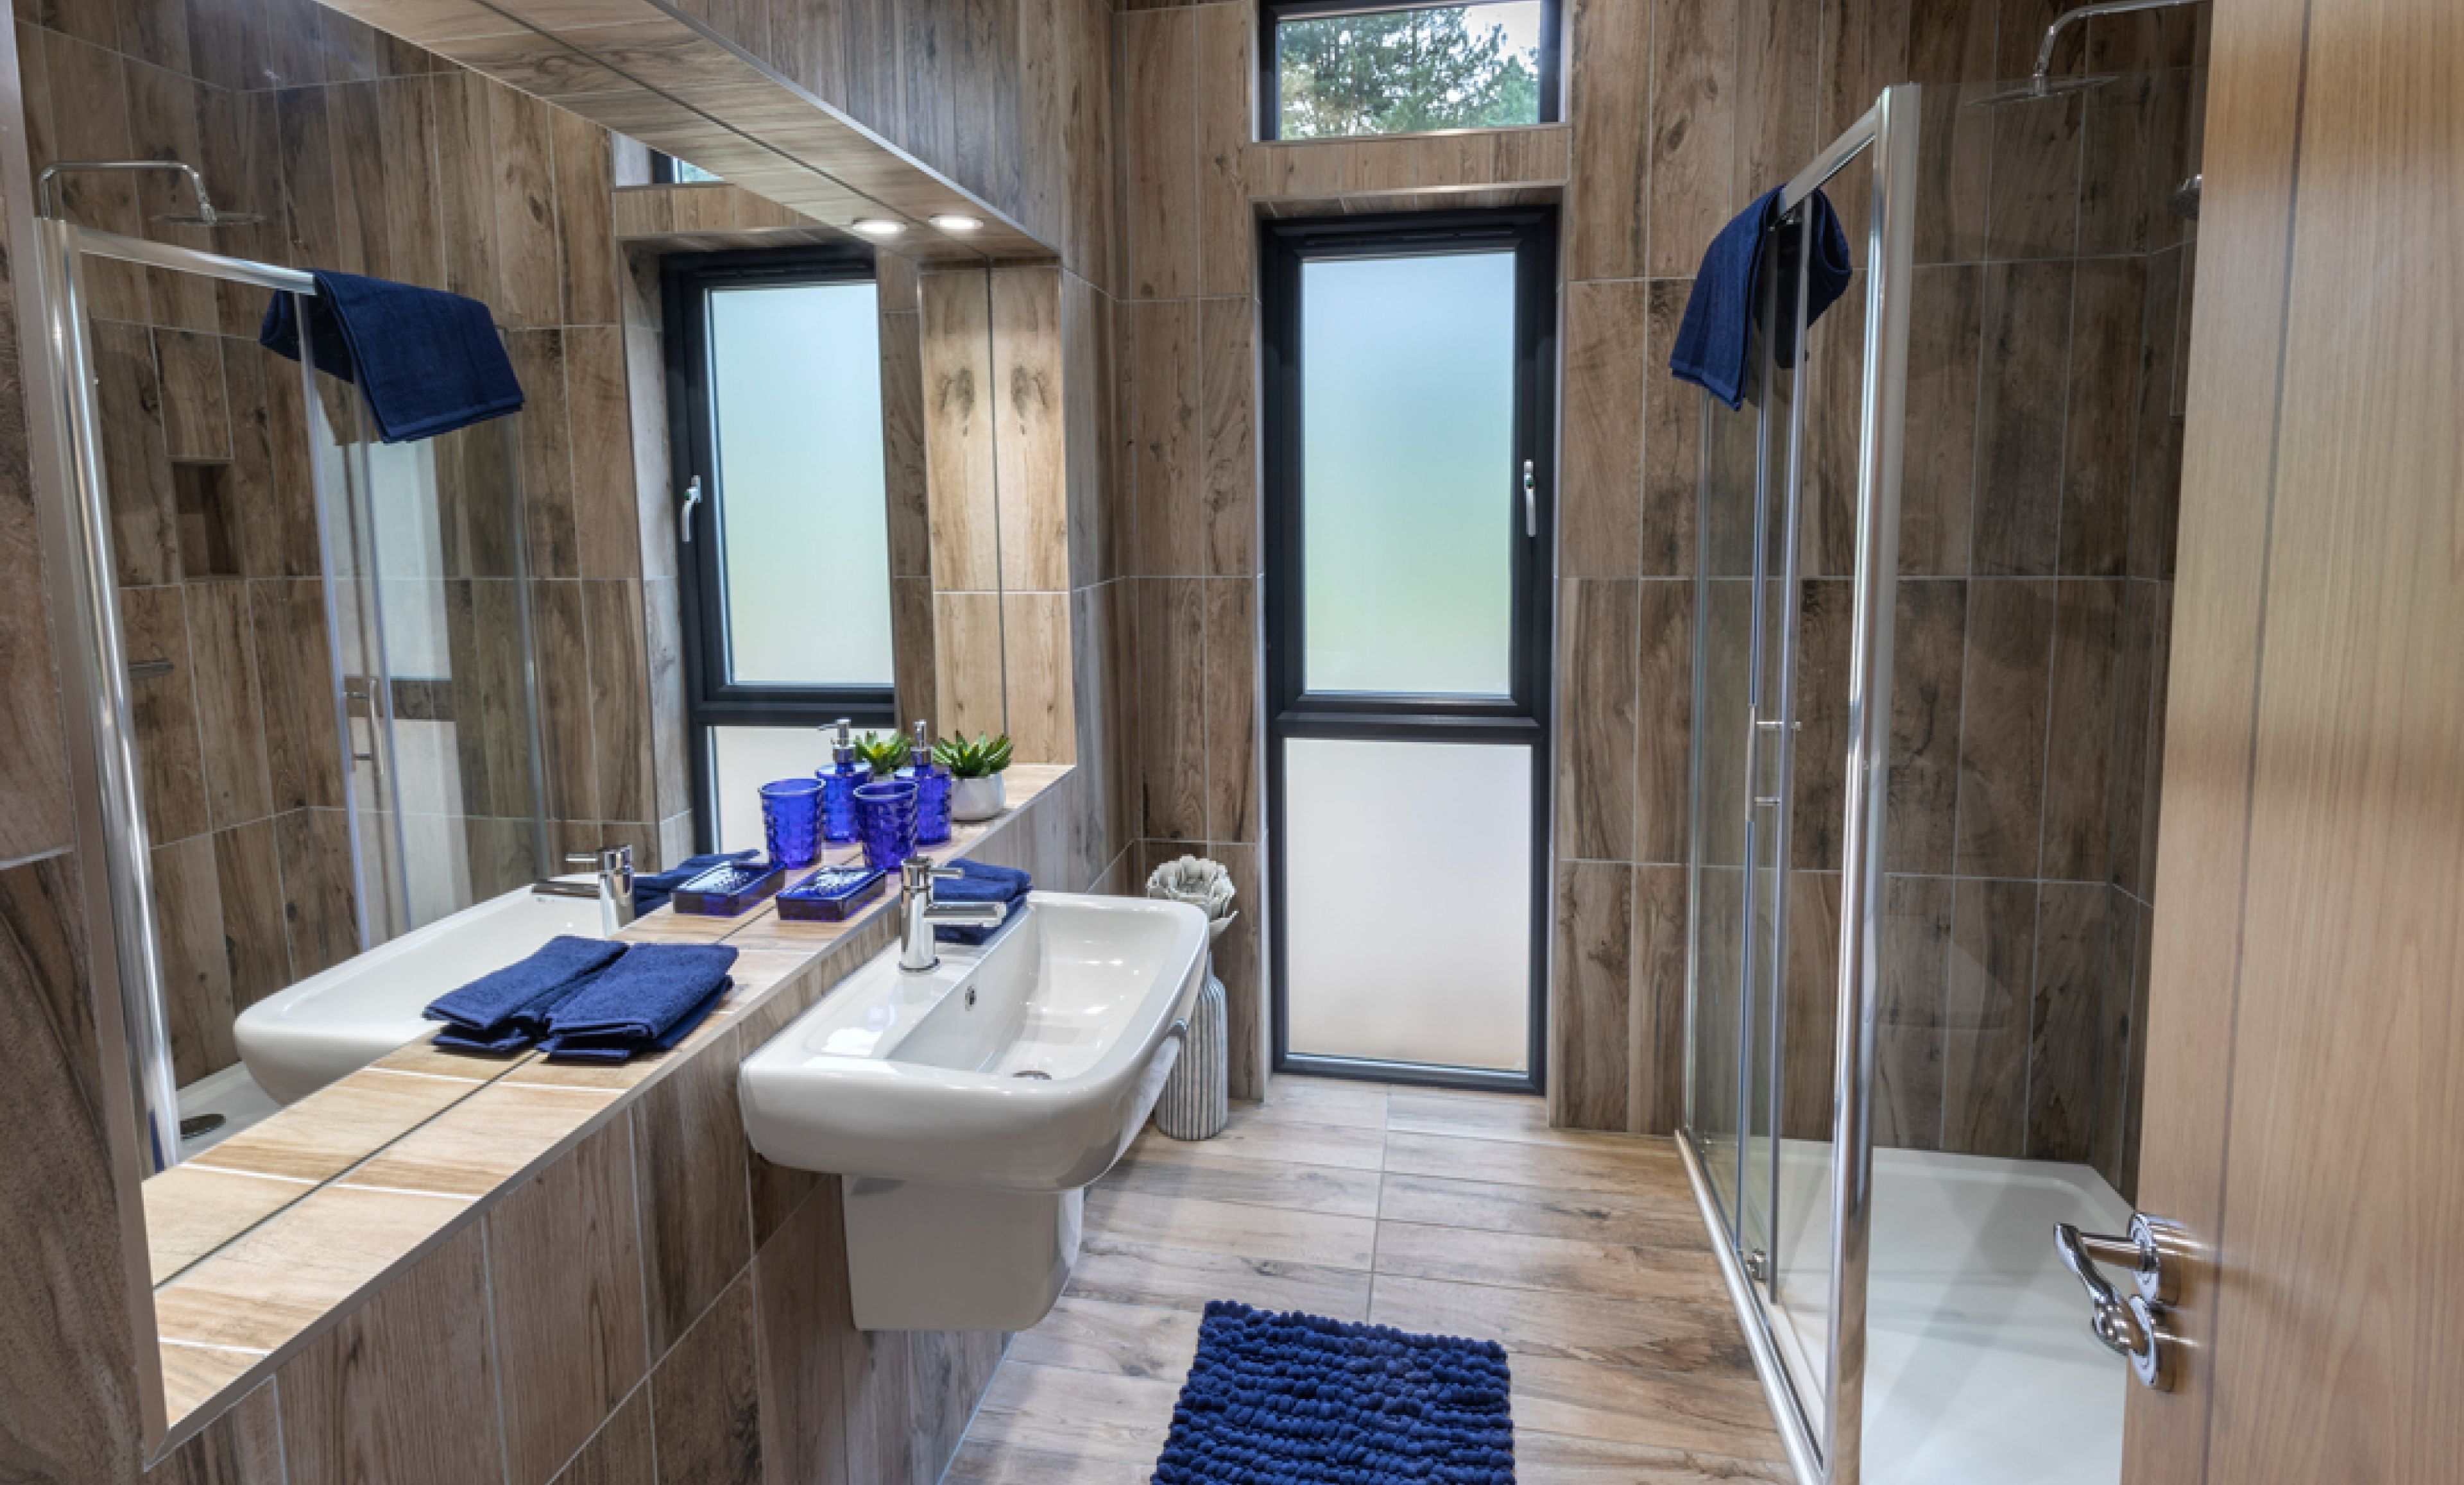 The Sherwood Bathroom